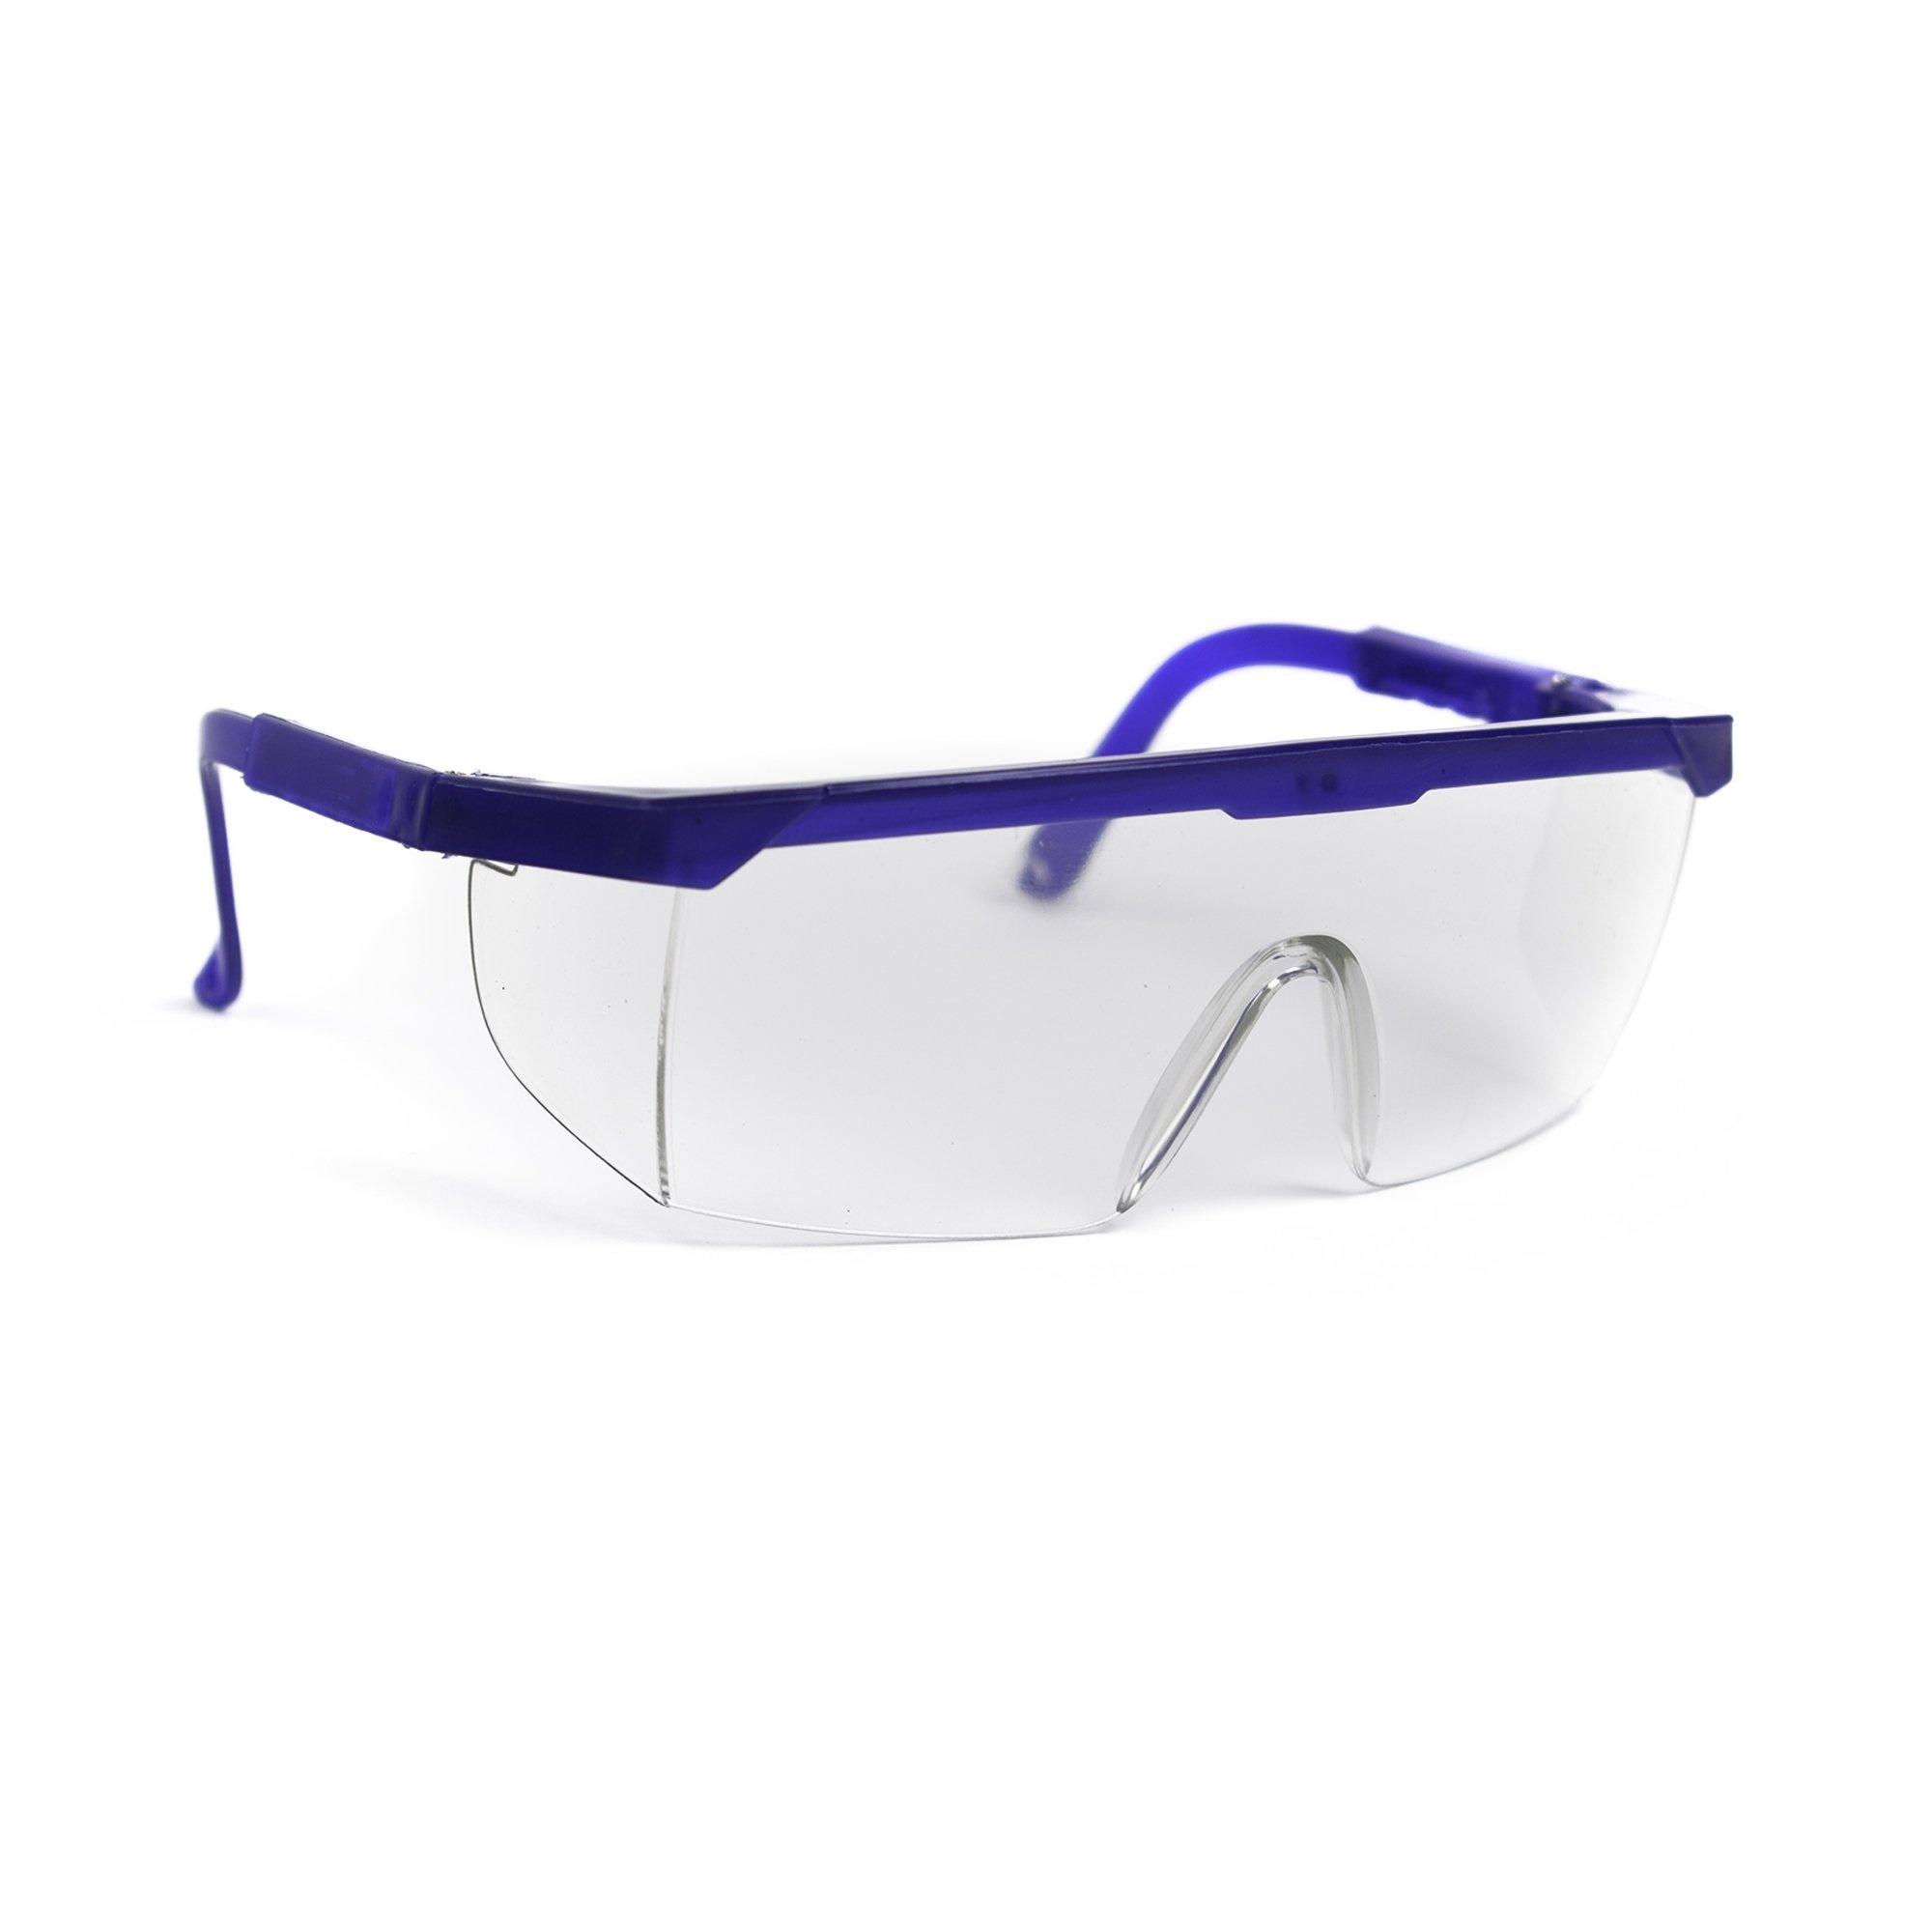 McKesson Protective Eyewear, 16-2291, 1 Each